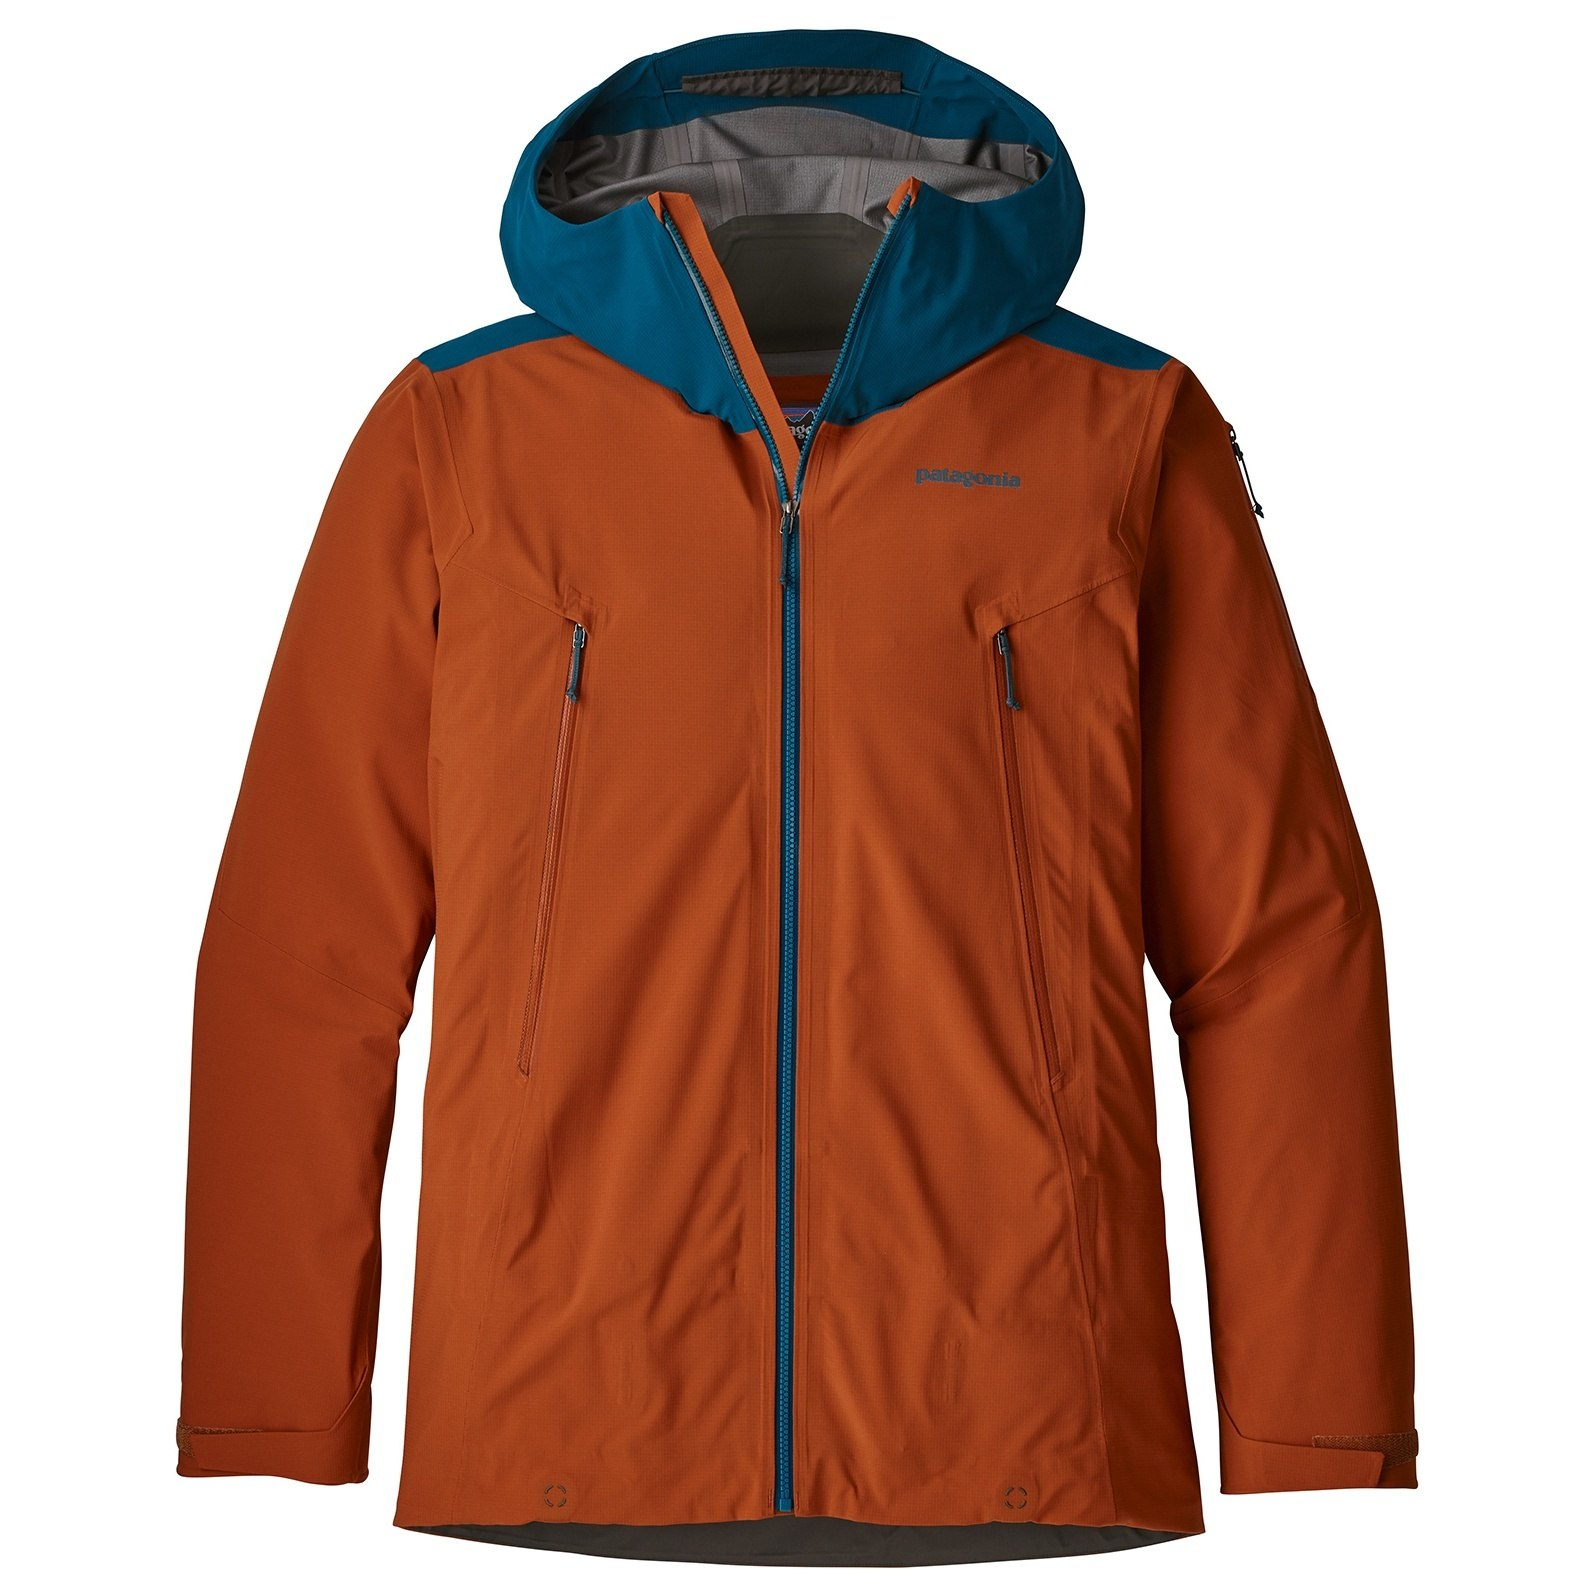 7987cb4274c Patagonia Men s Descensionist Jacket on Sale